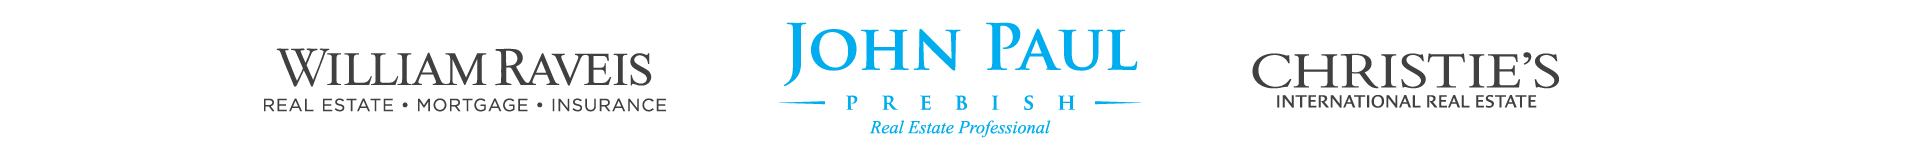 John Paul Prebish, PA